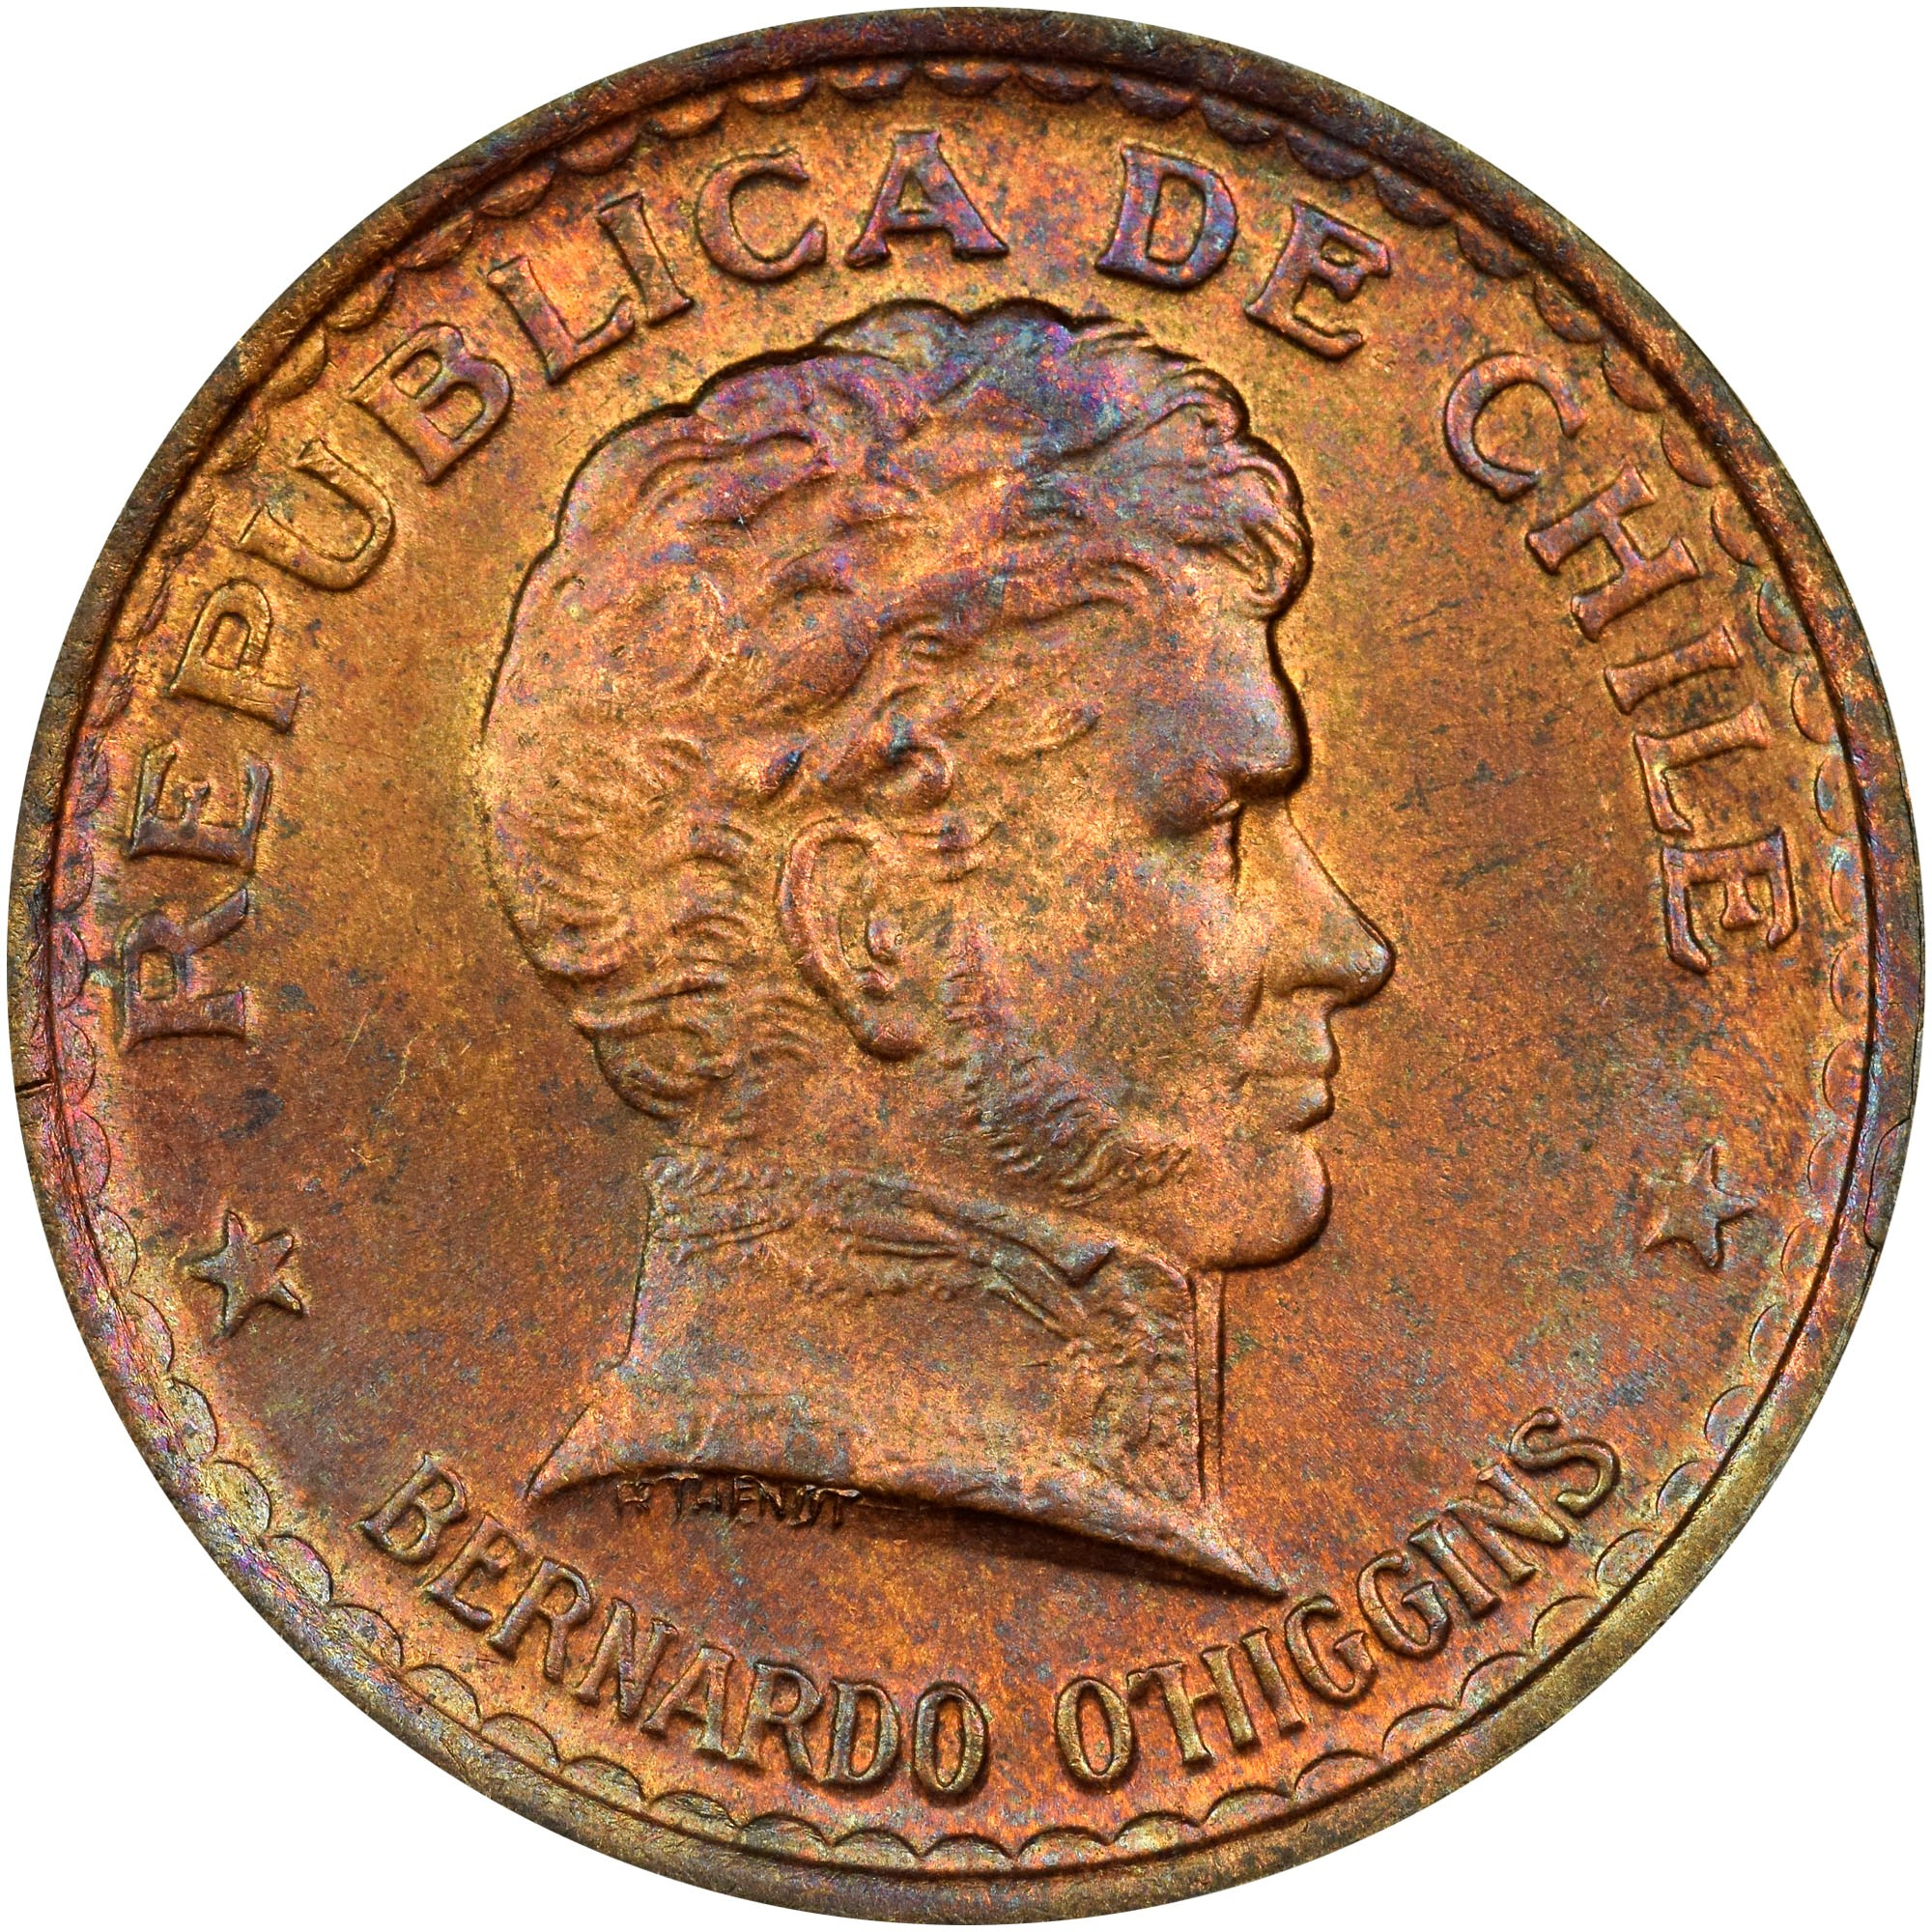 Chile 50 Centavos obverse